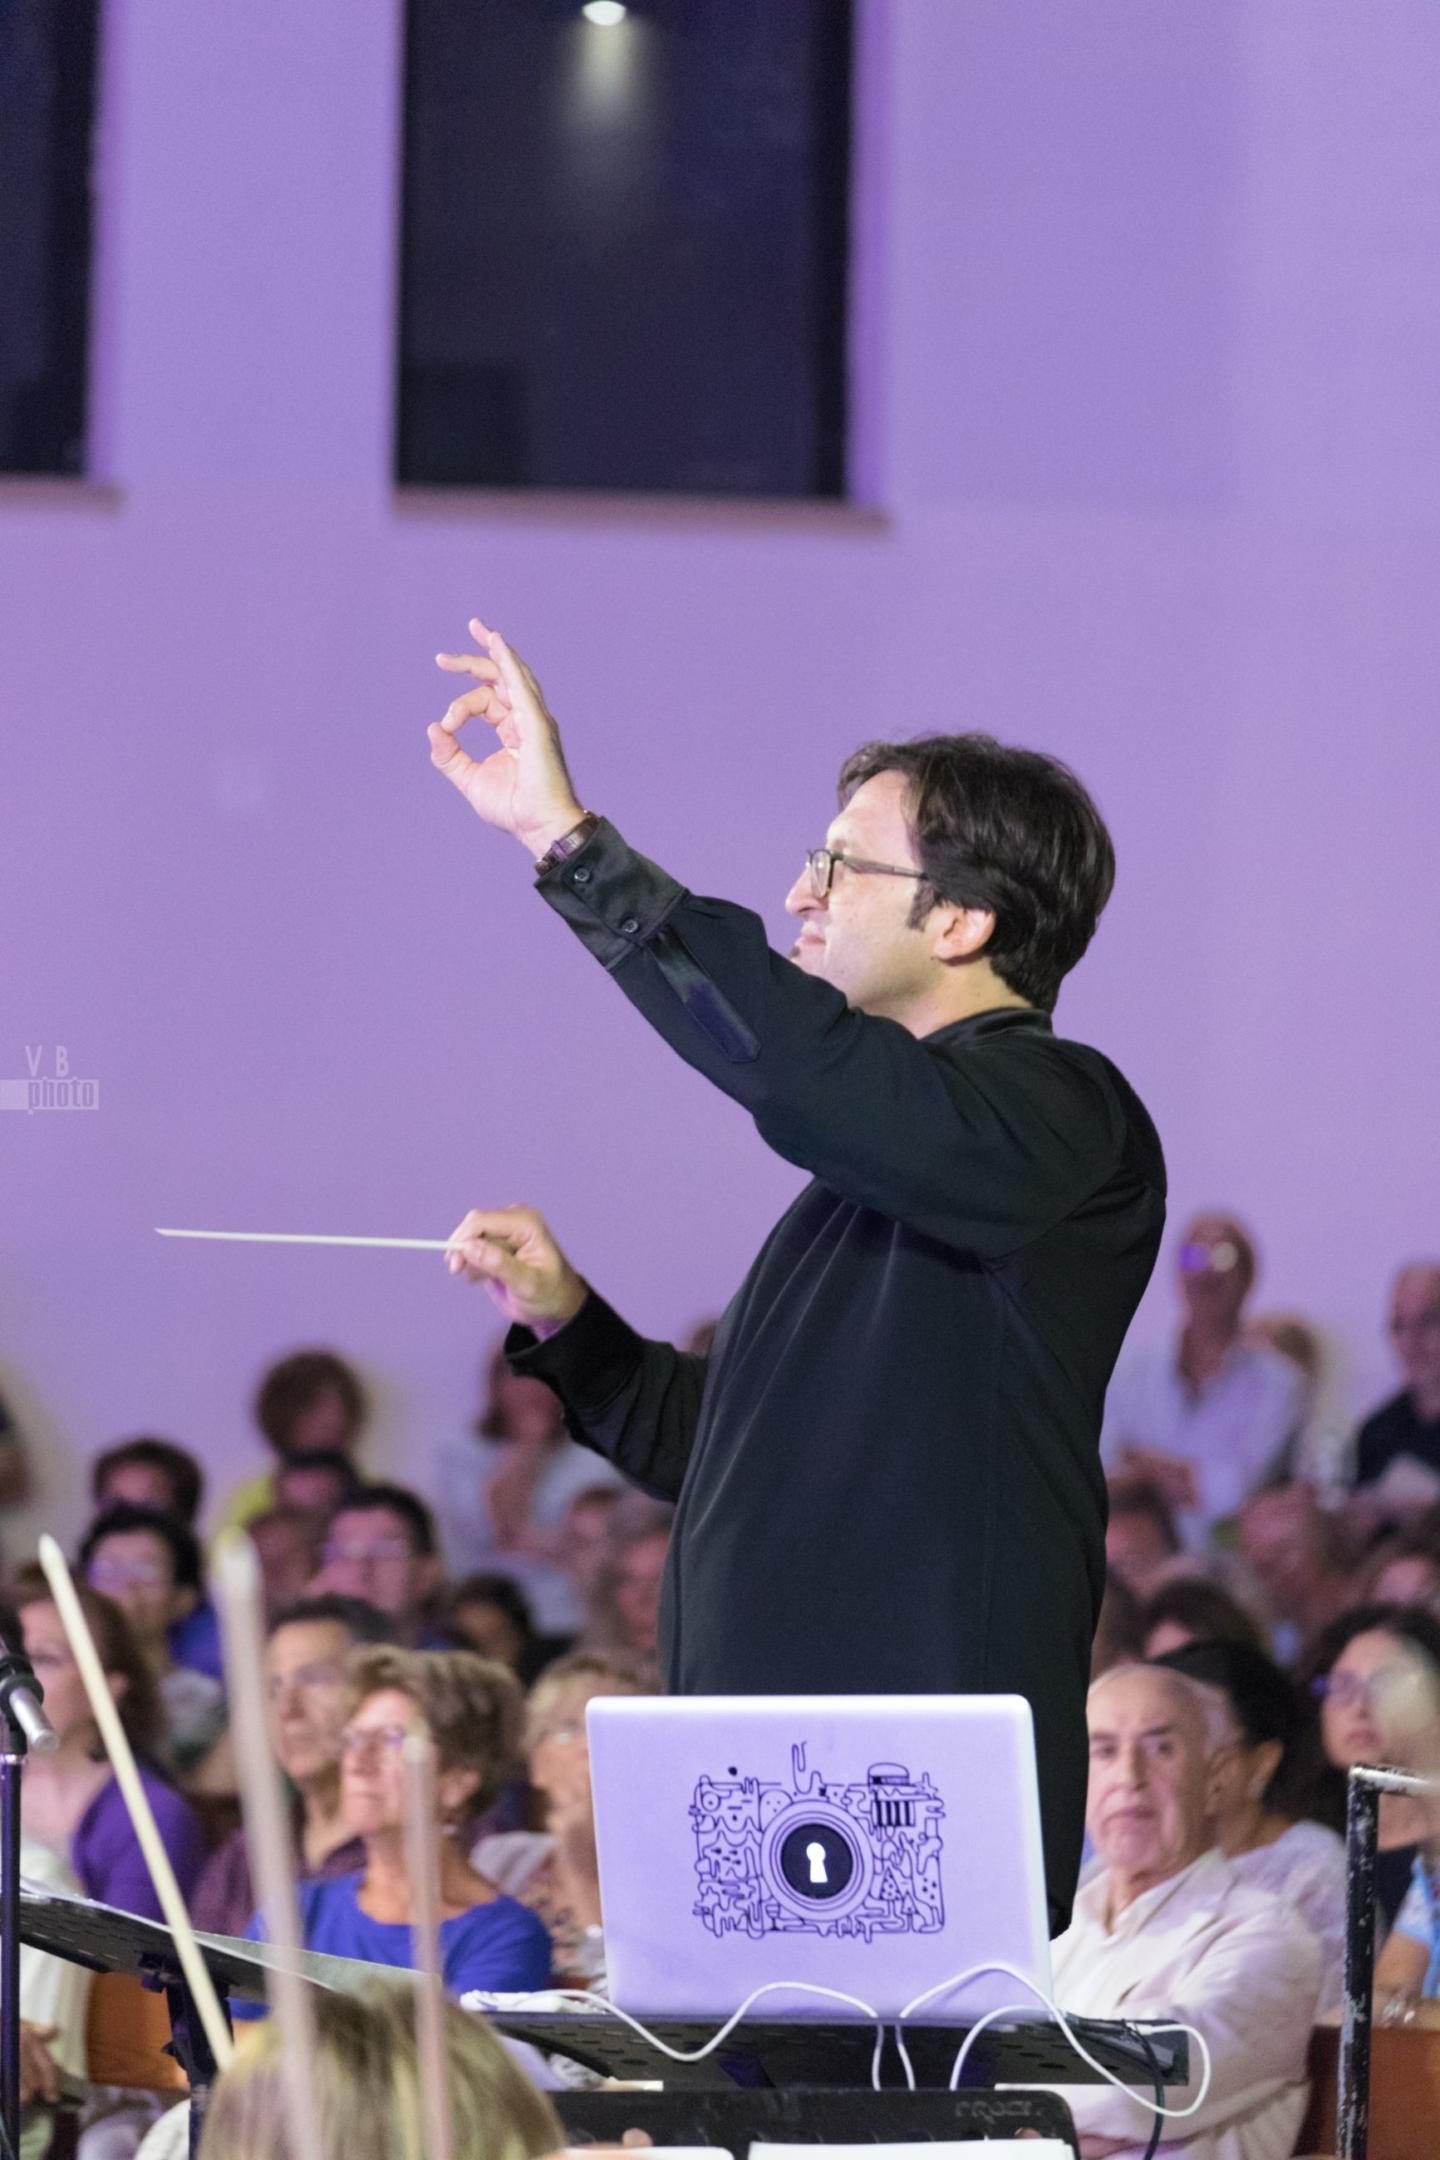 Orchestra Sinfonica Metropolitana - 4 settembre 2017 - Molfetta